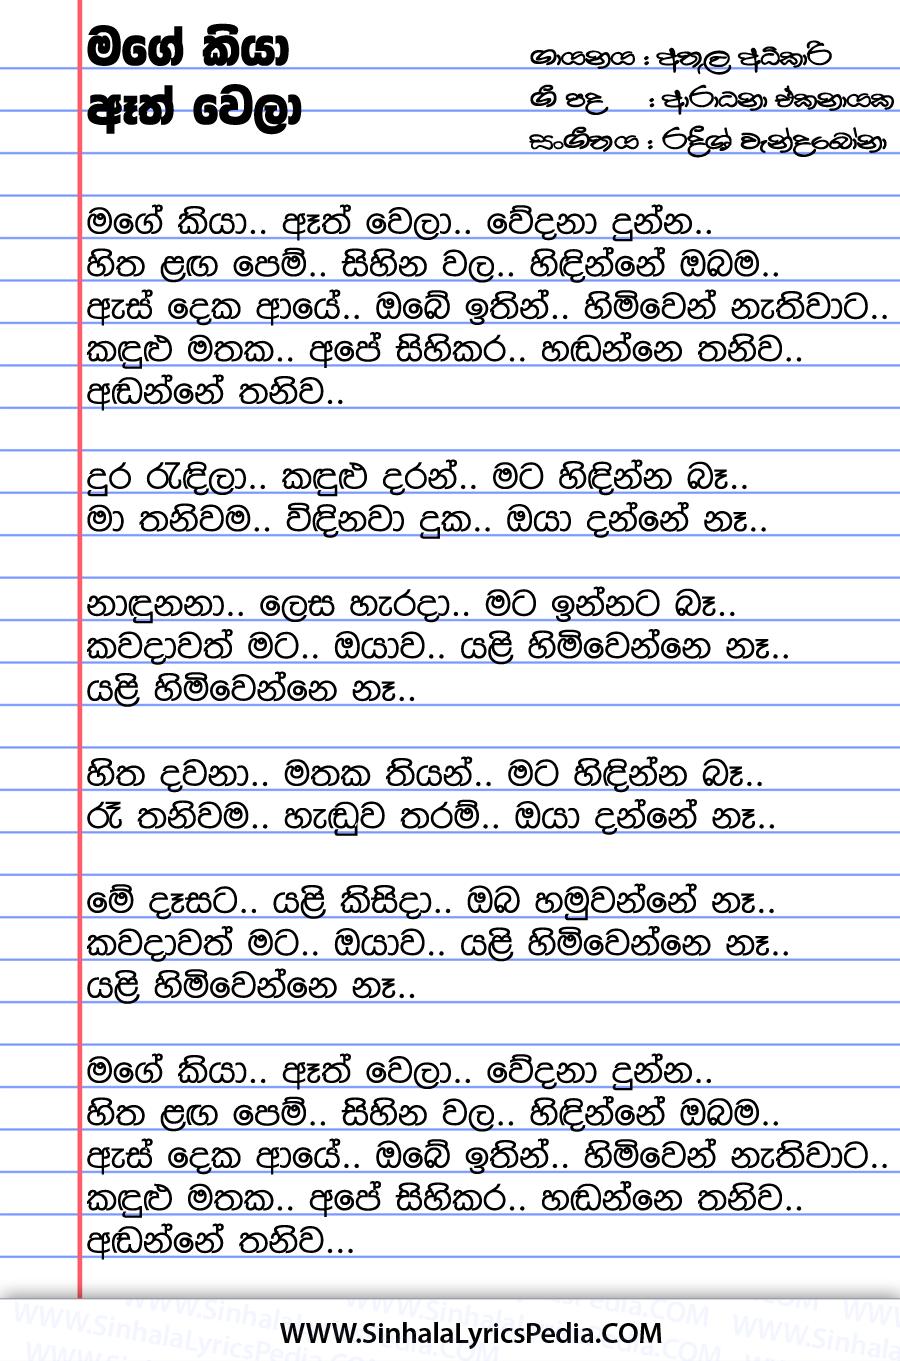 Mage Kiya Ath Wela Song Lyrics